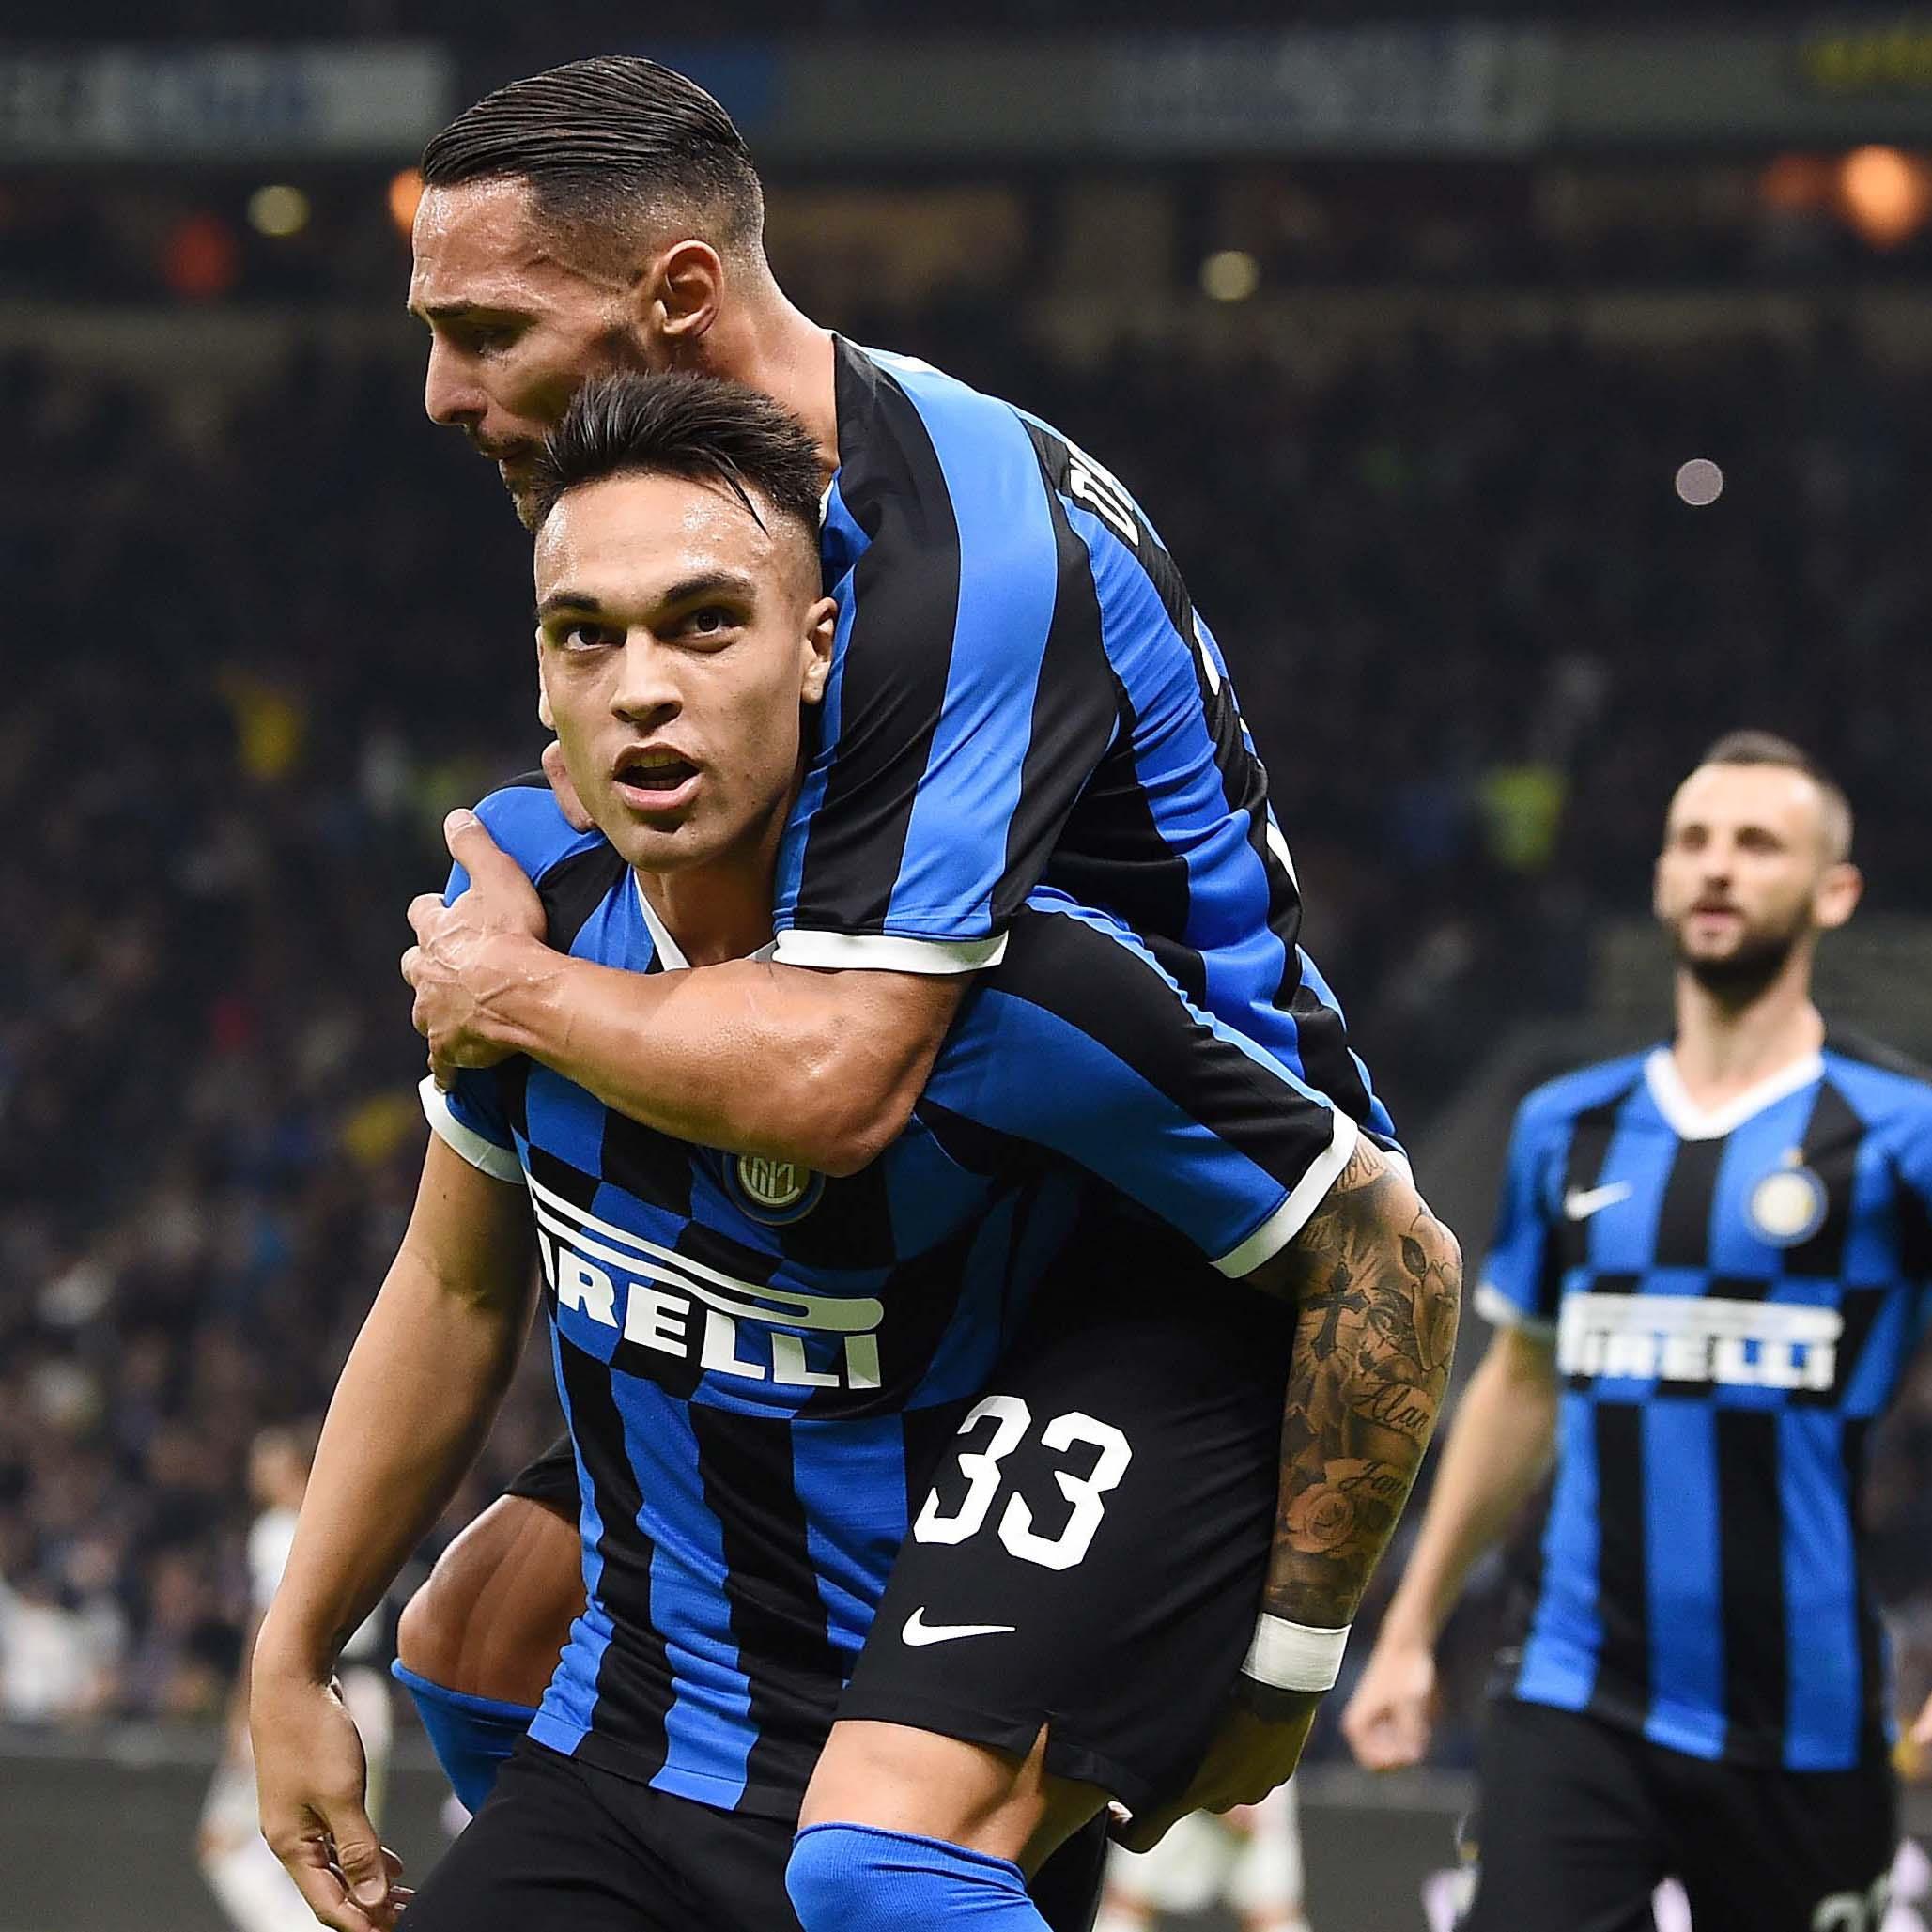 Inter Milan - Lazio Roma (zo. 31 maart 2019)